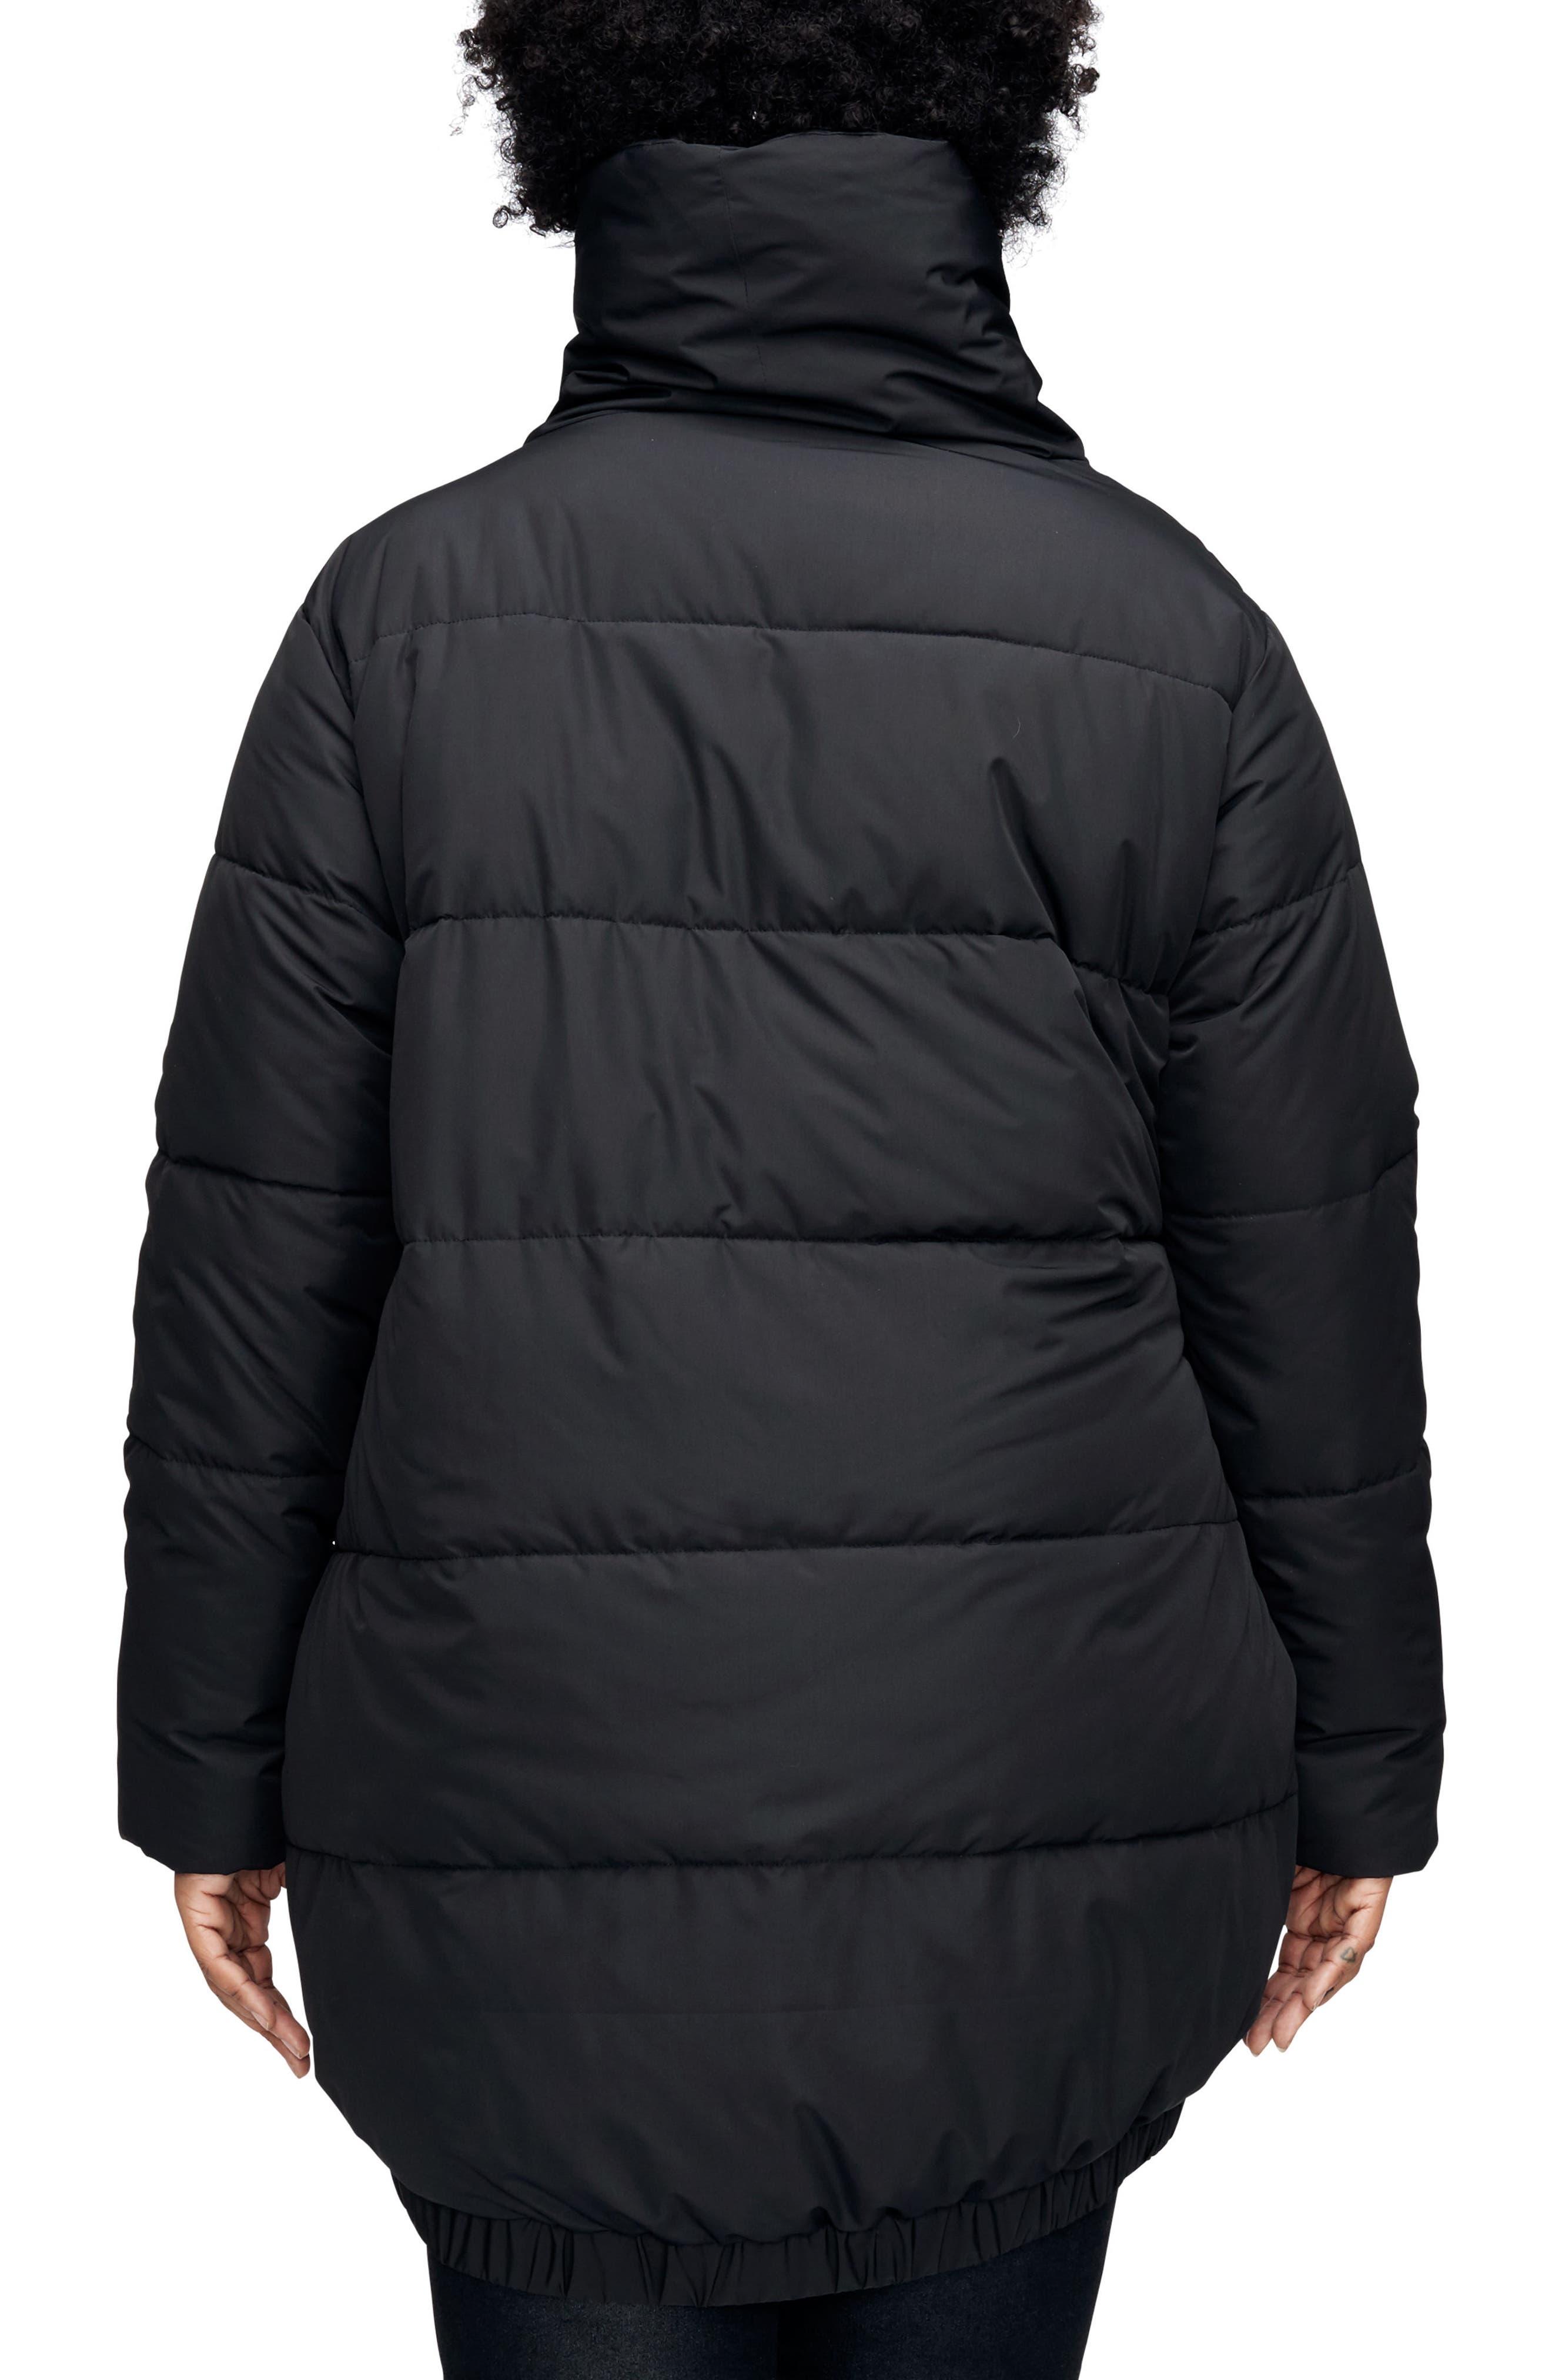 Kanda Puffer Jacket,                             Alternate thumbnail 2, color,                             BLACK